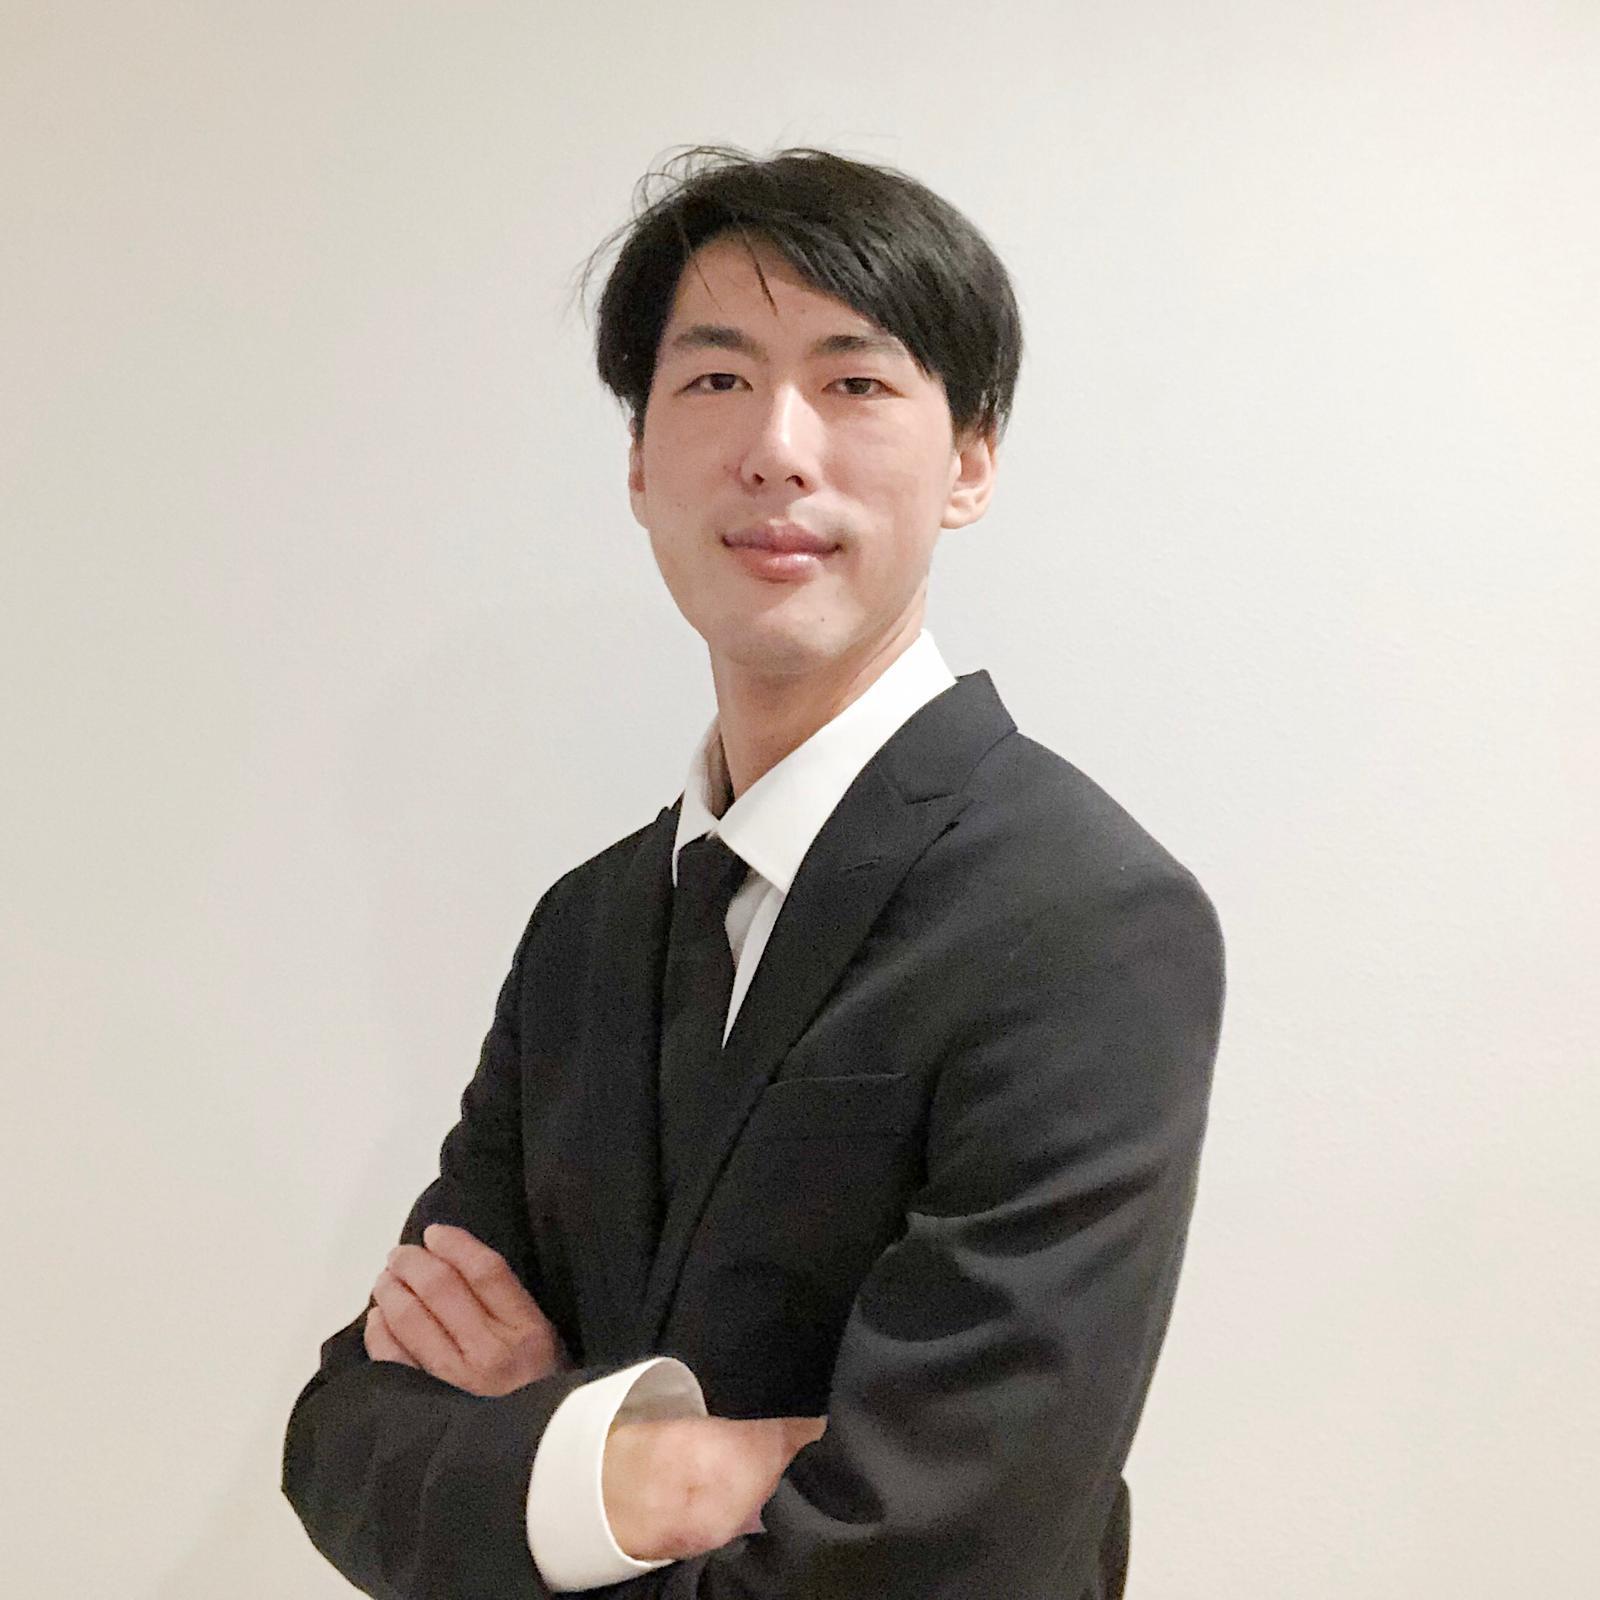 Richie Han